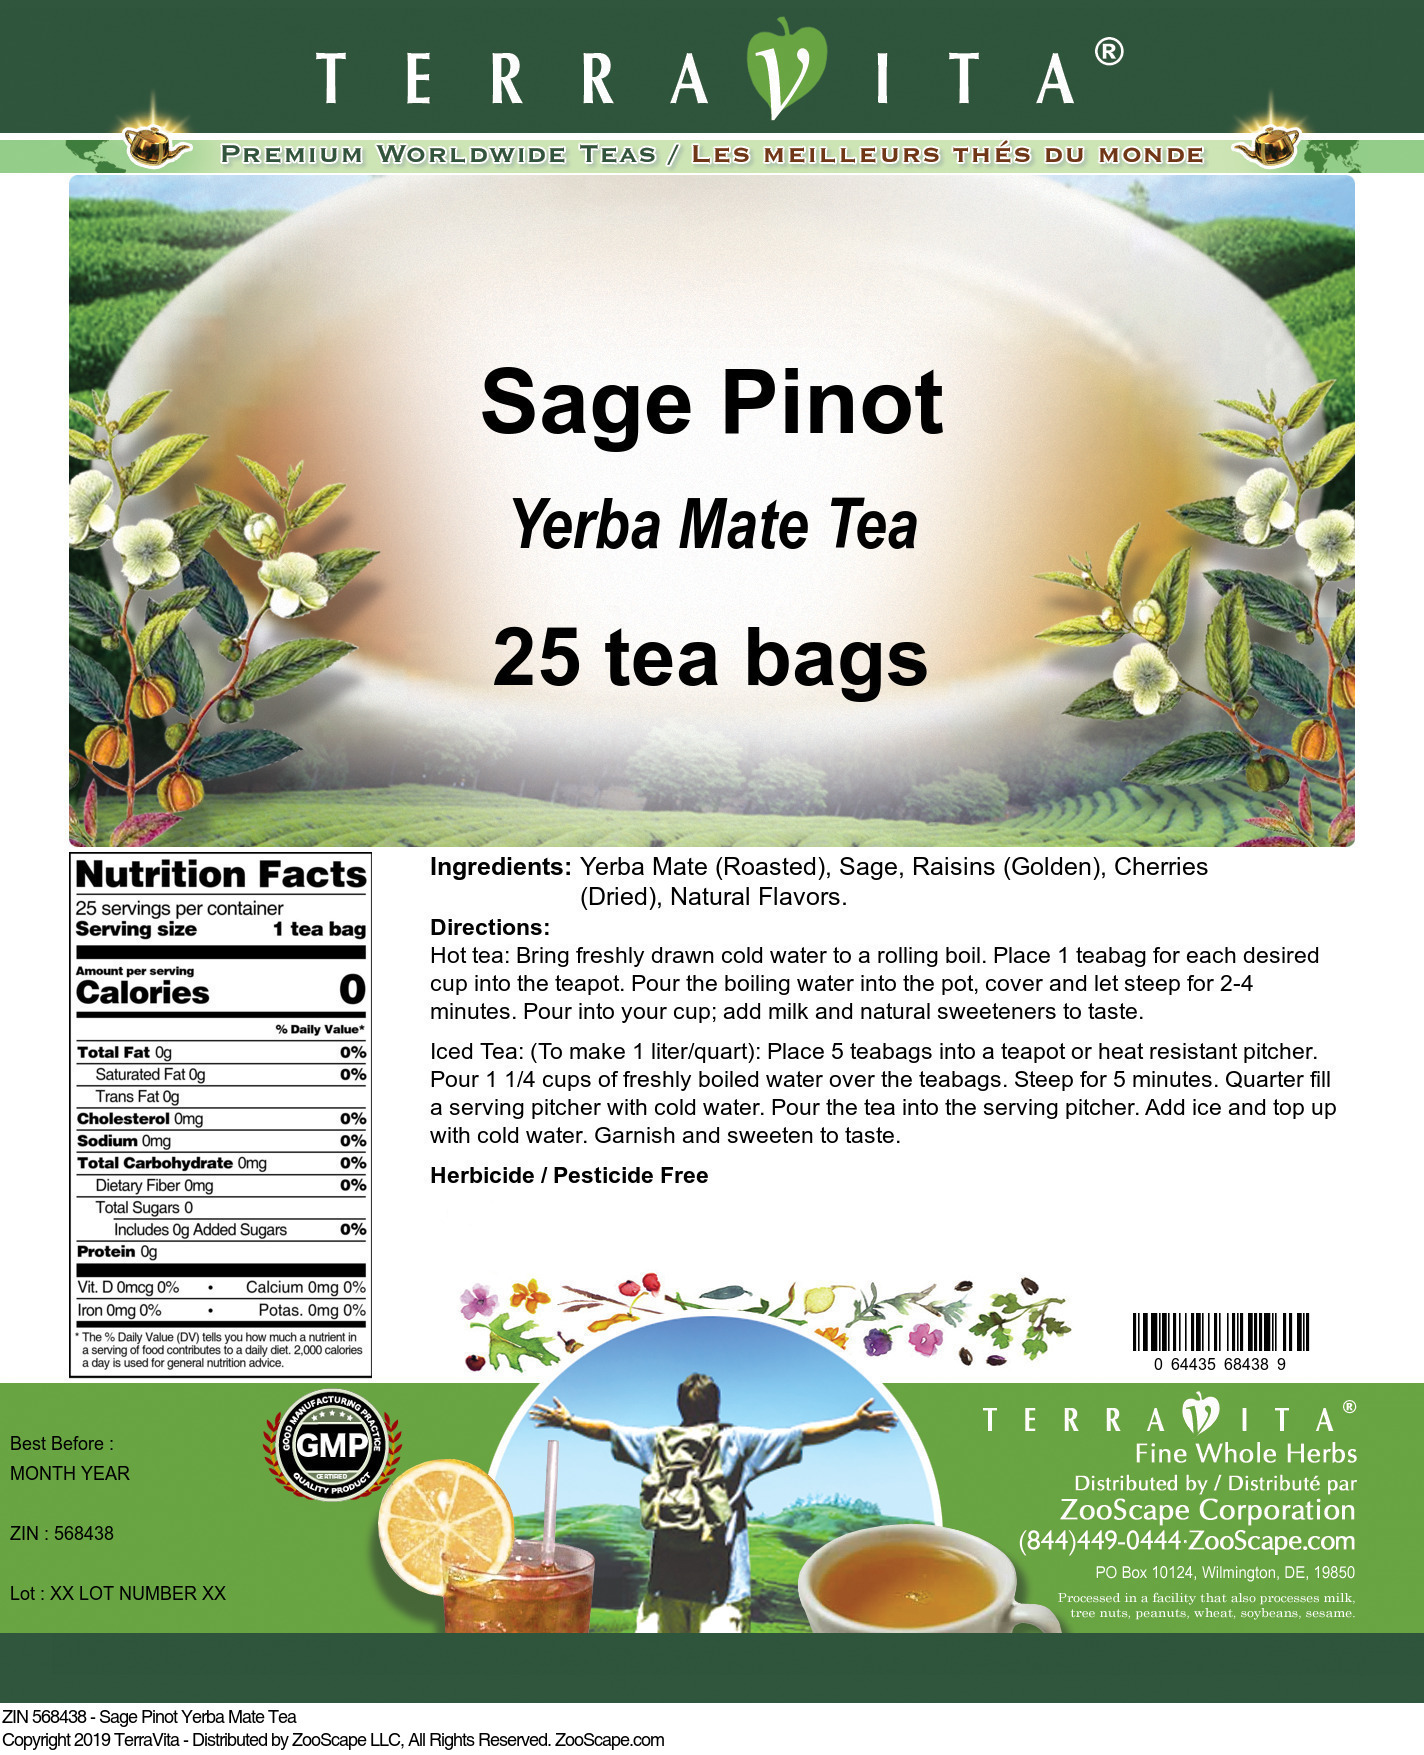 Sage Pinot Yerba Mate Tea